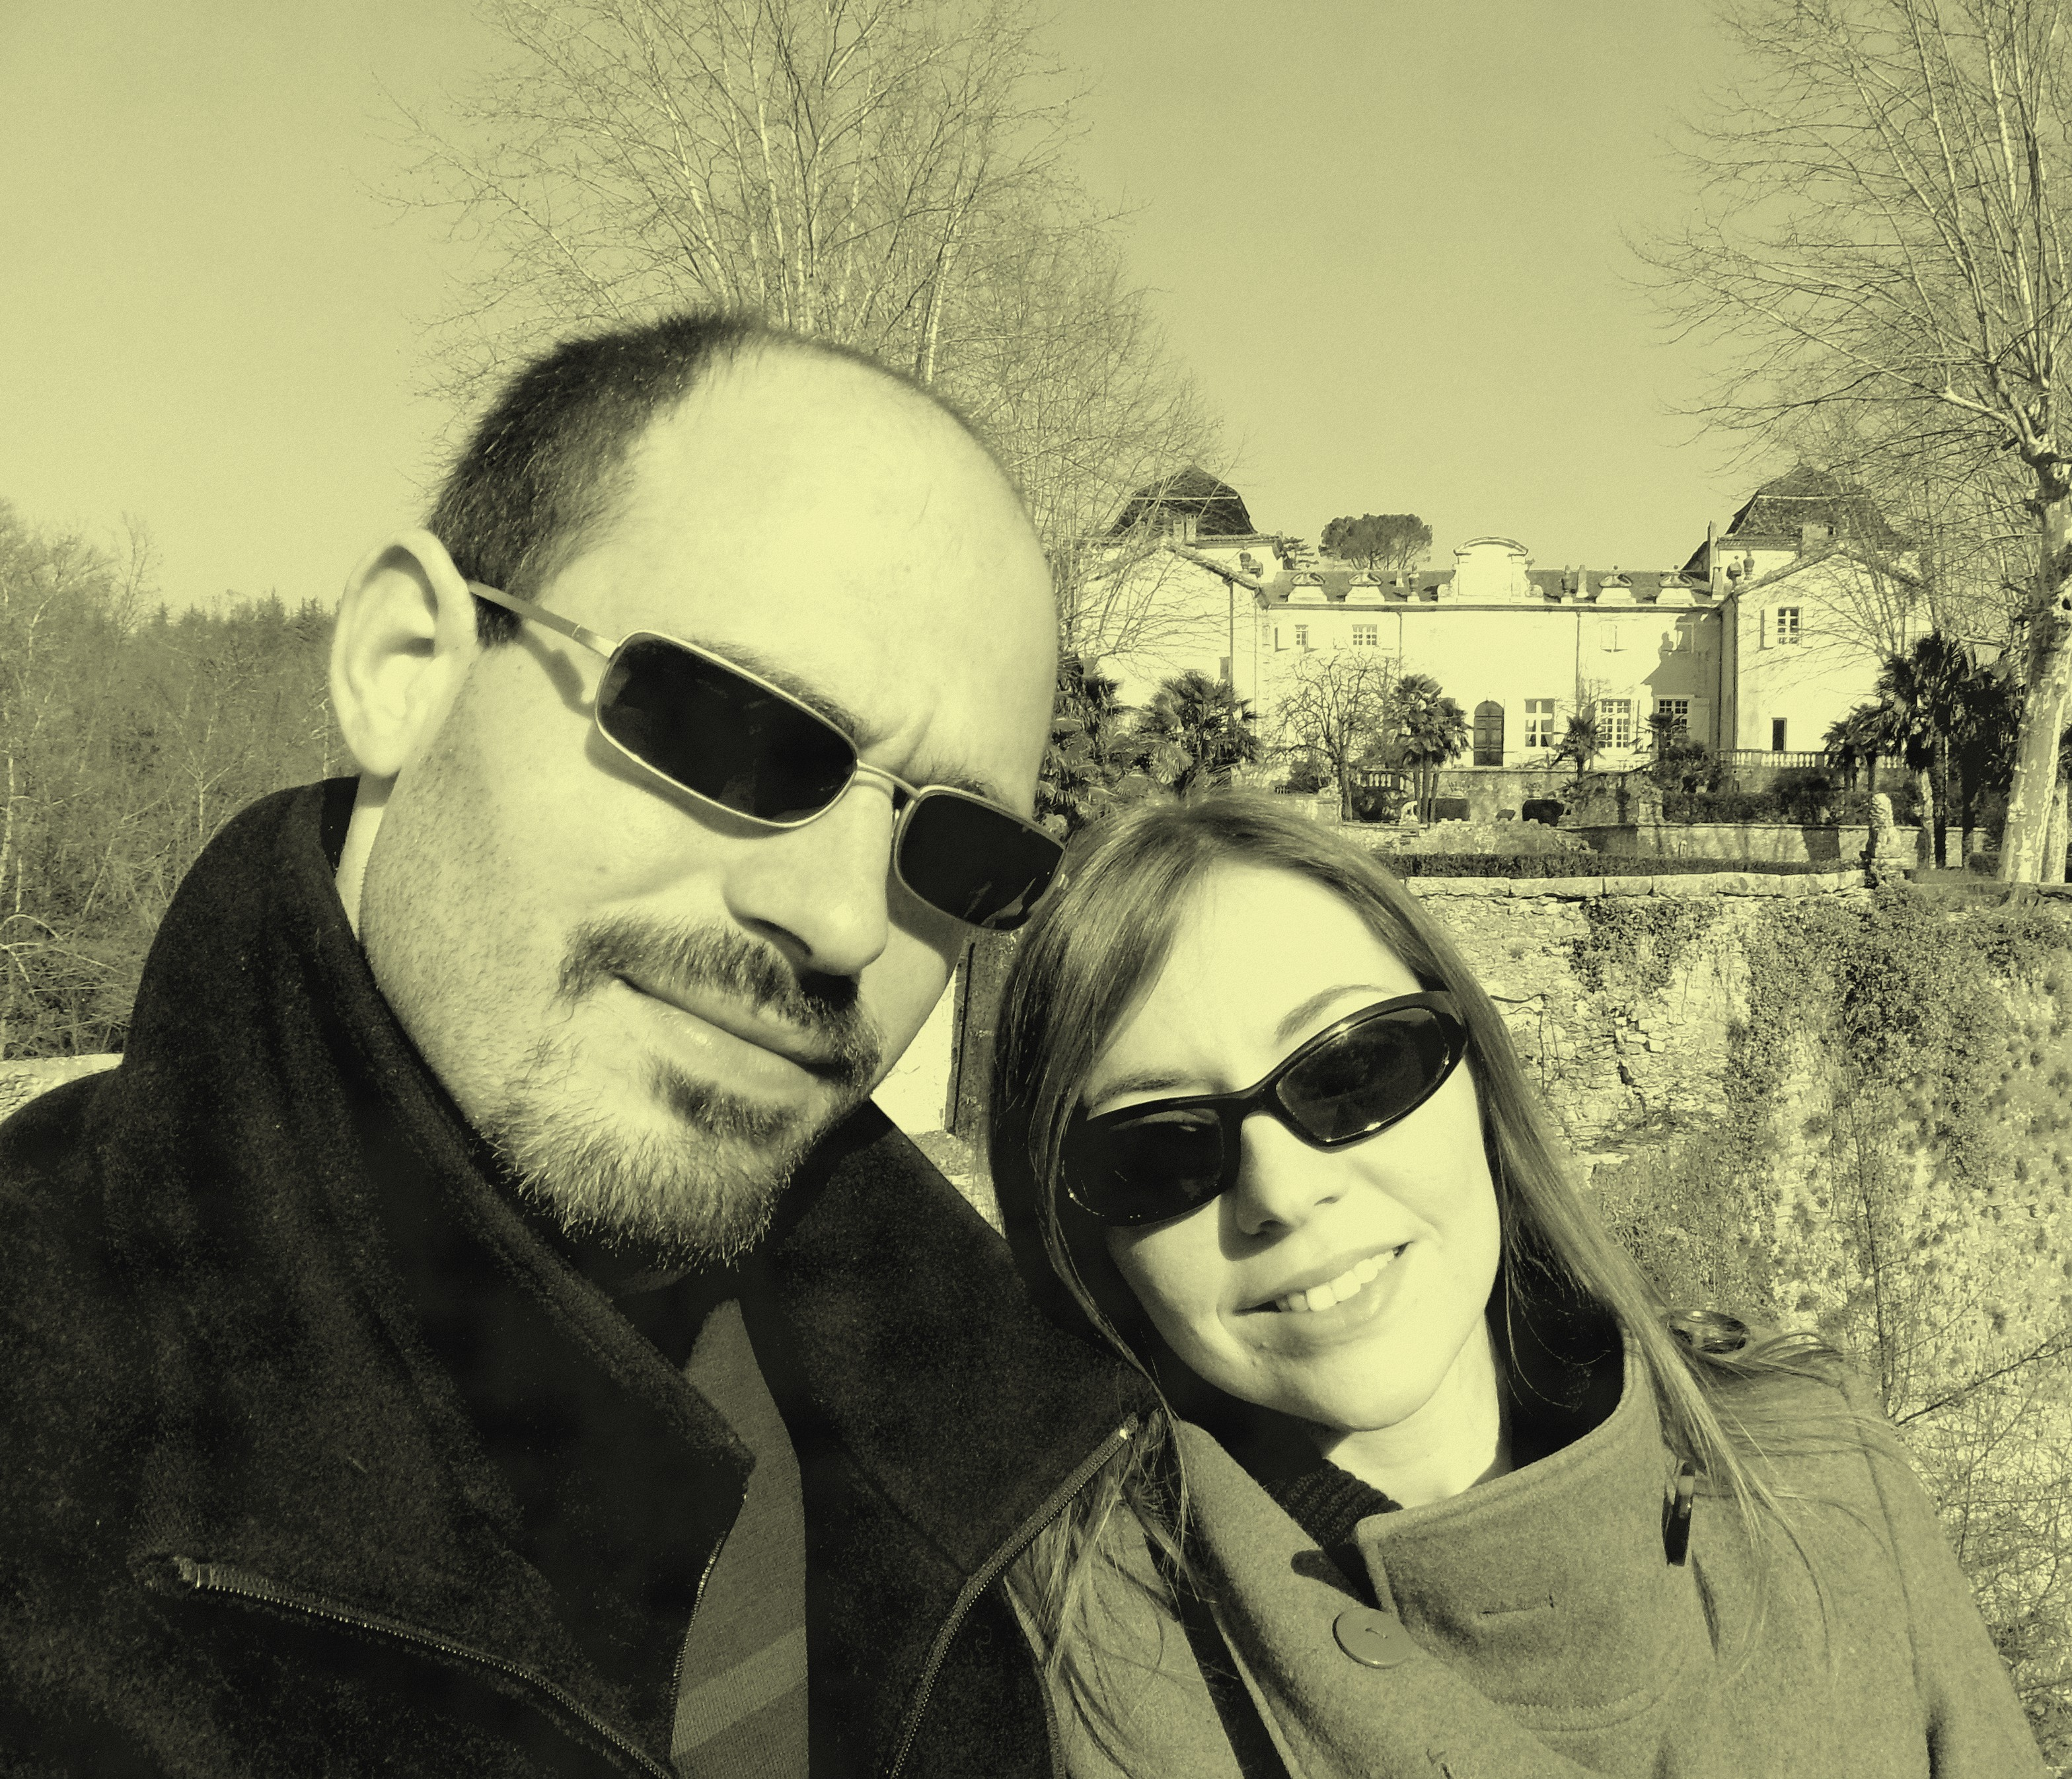 Bienvenue à Mademoiselle Galinou, future mariée d'août 2012